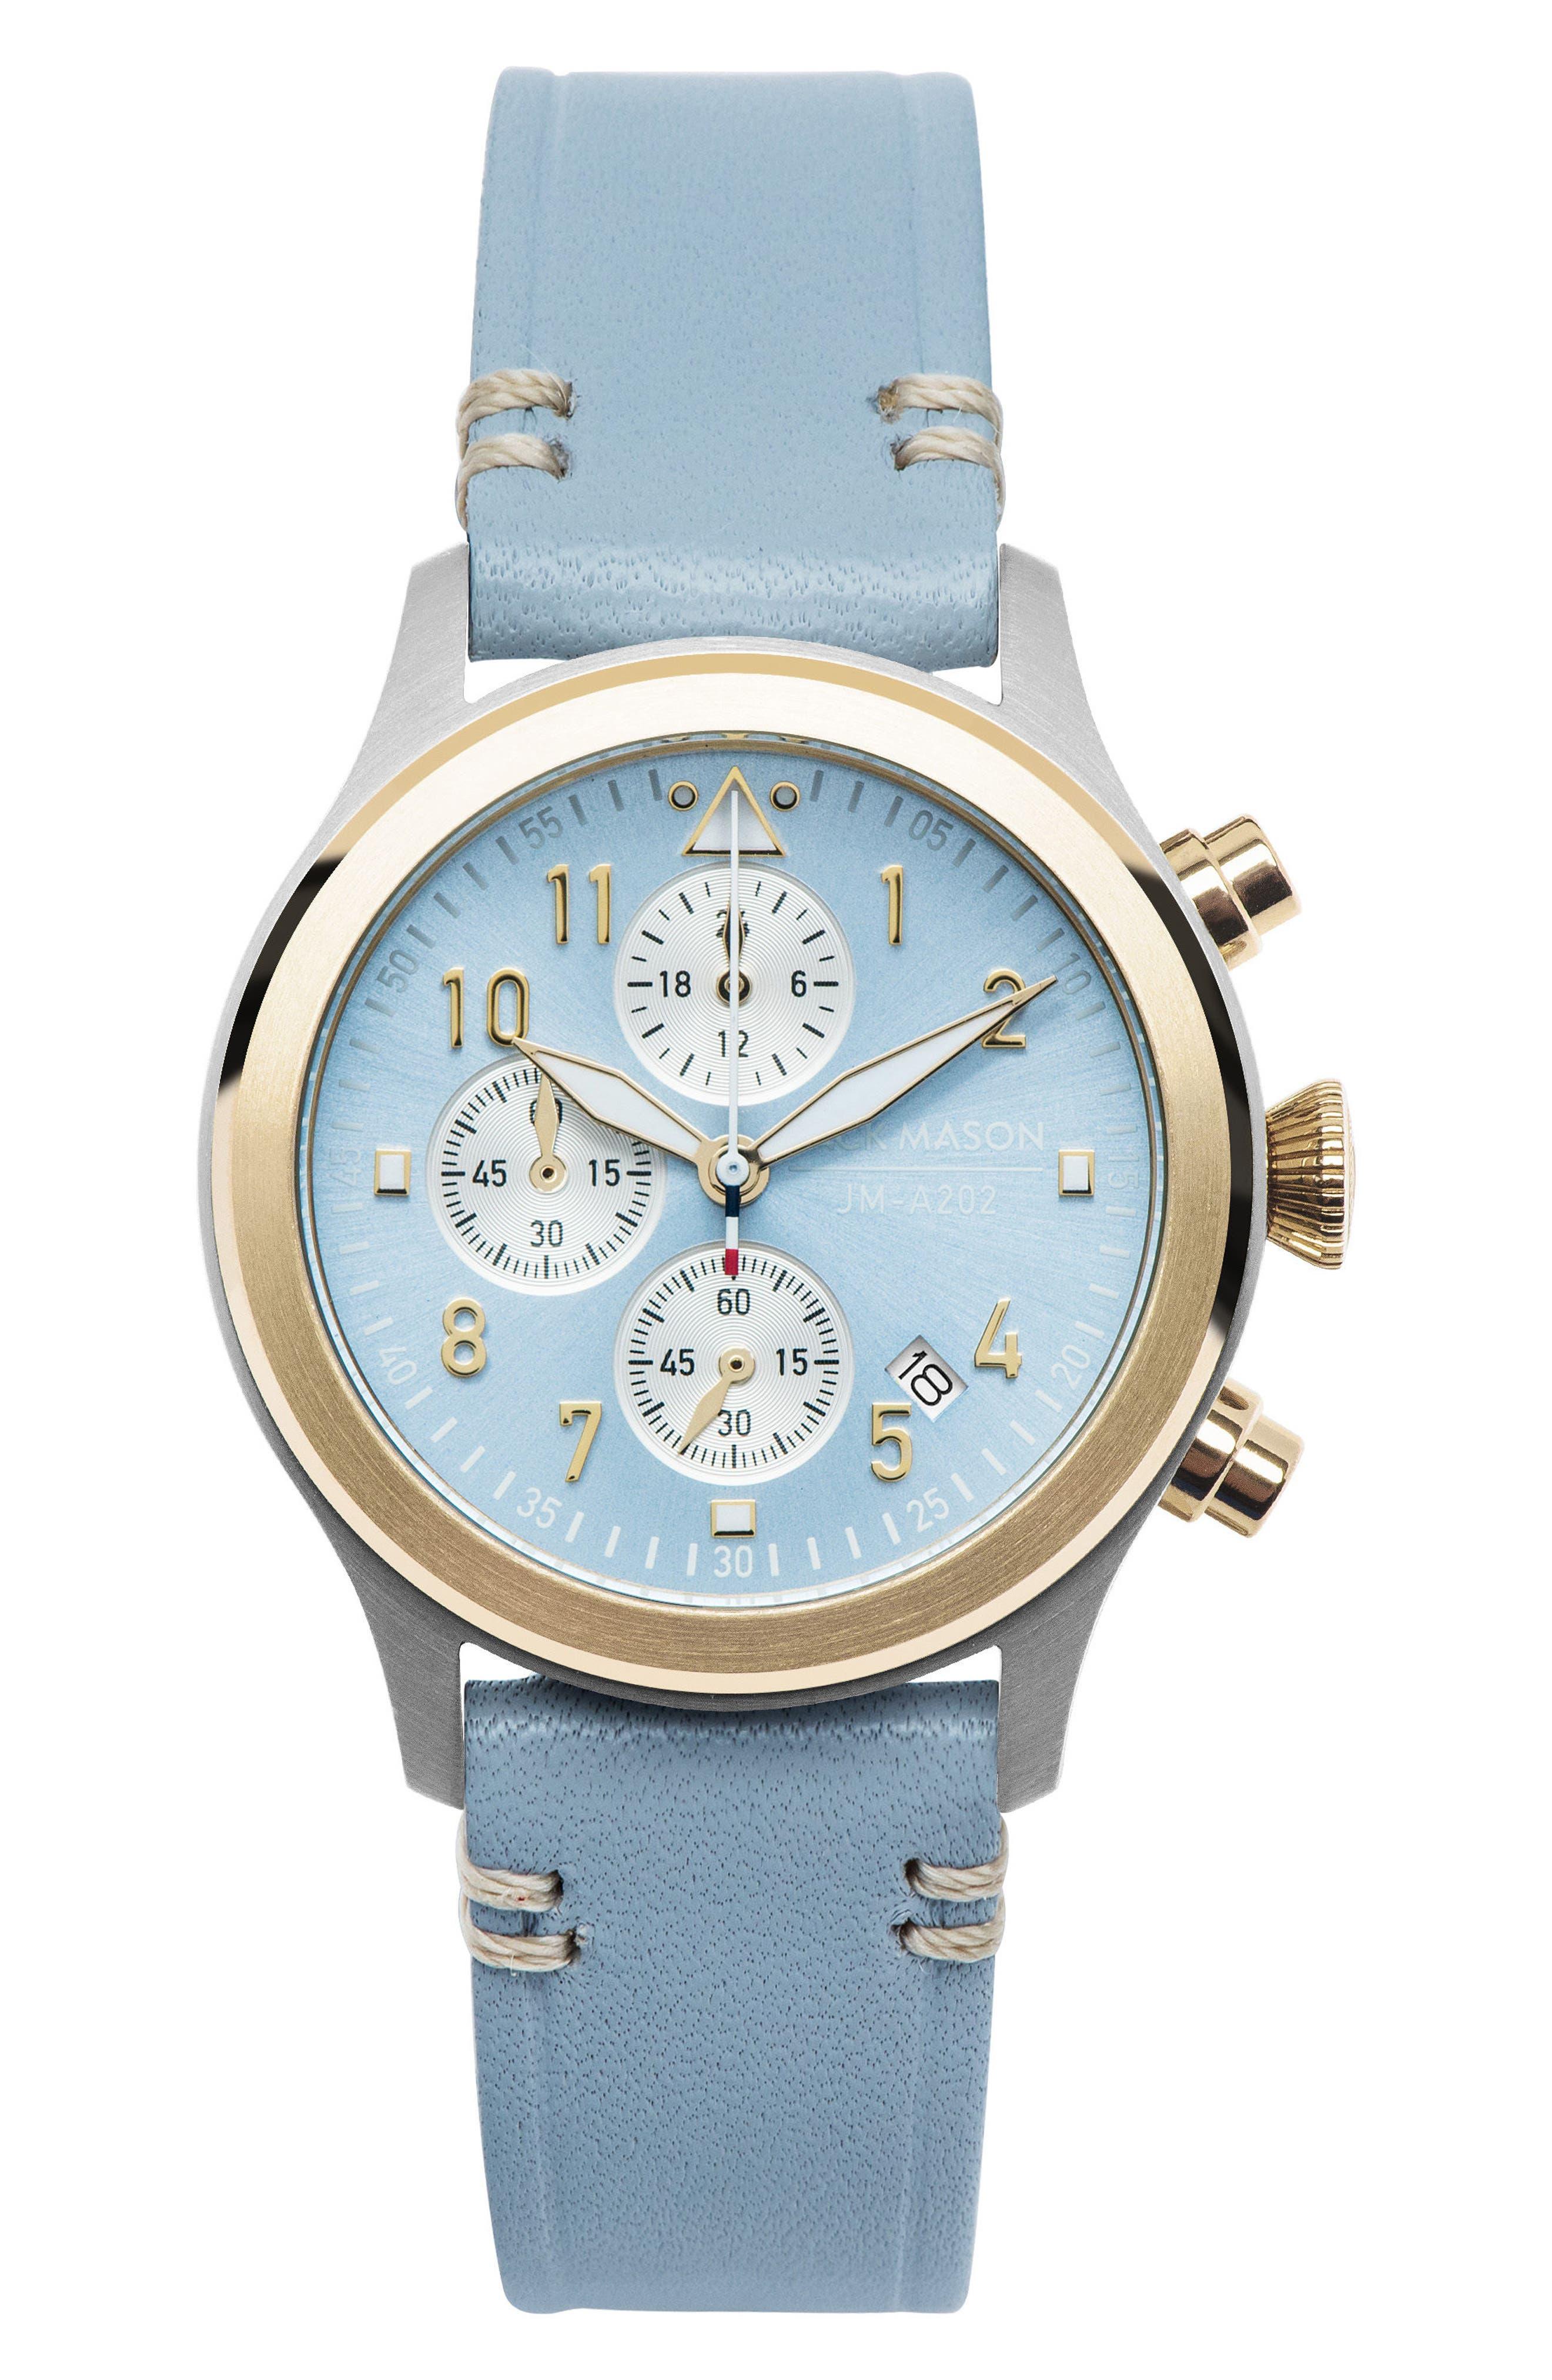 Jack Mason Aviation Chronograph Leather Strap Watch, 36mm